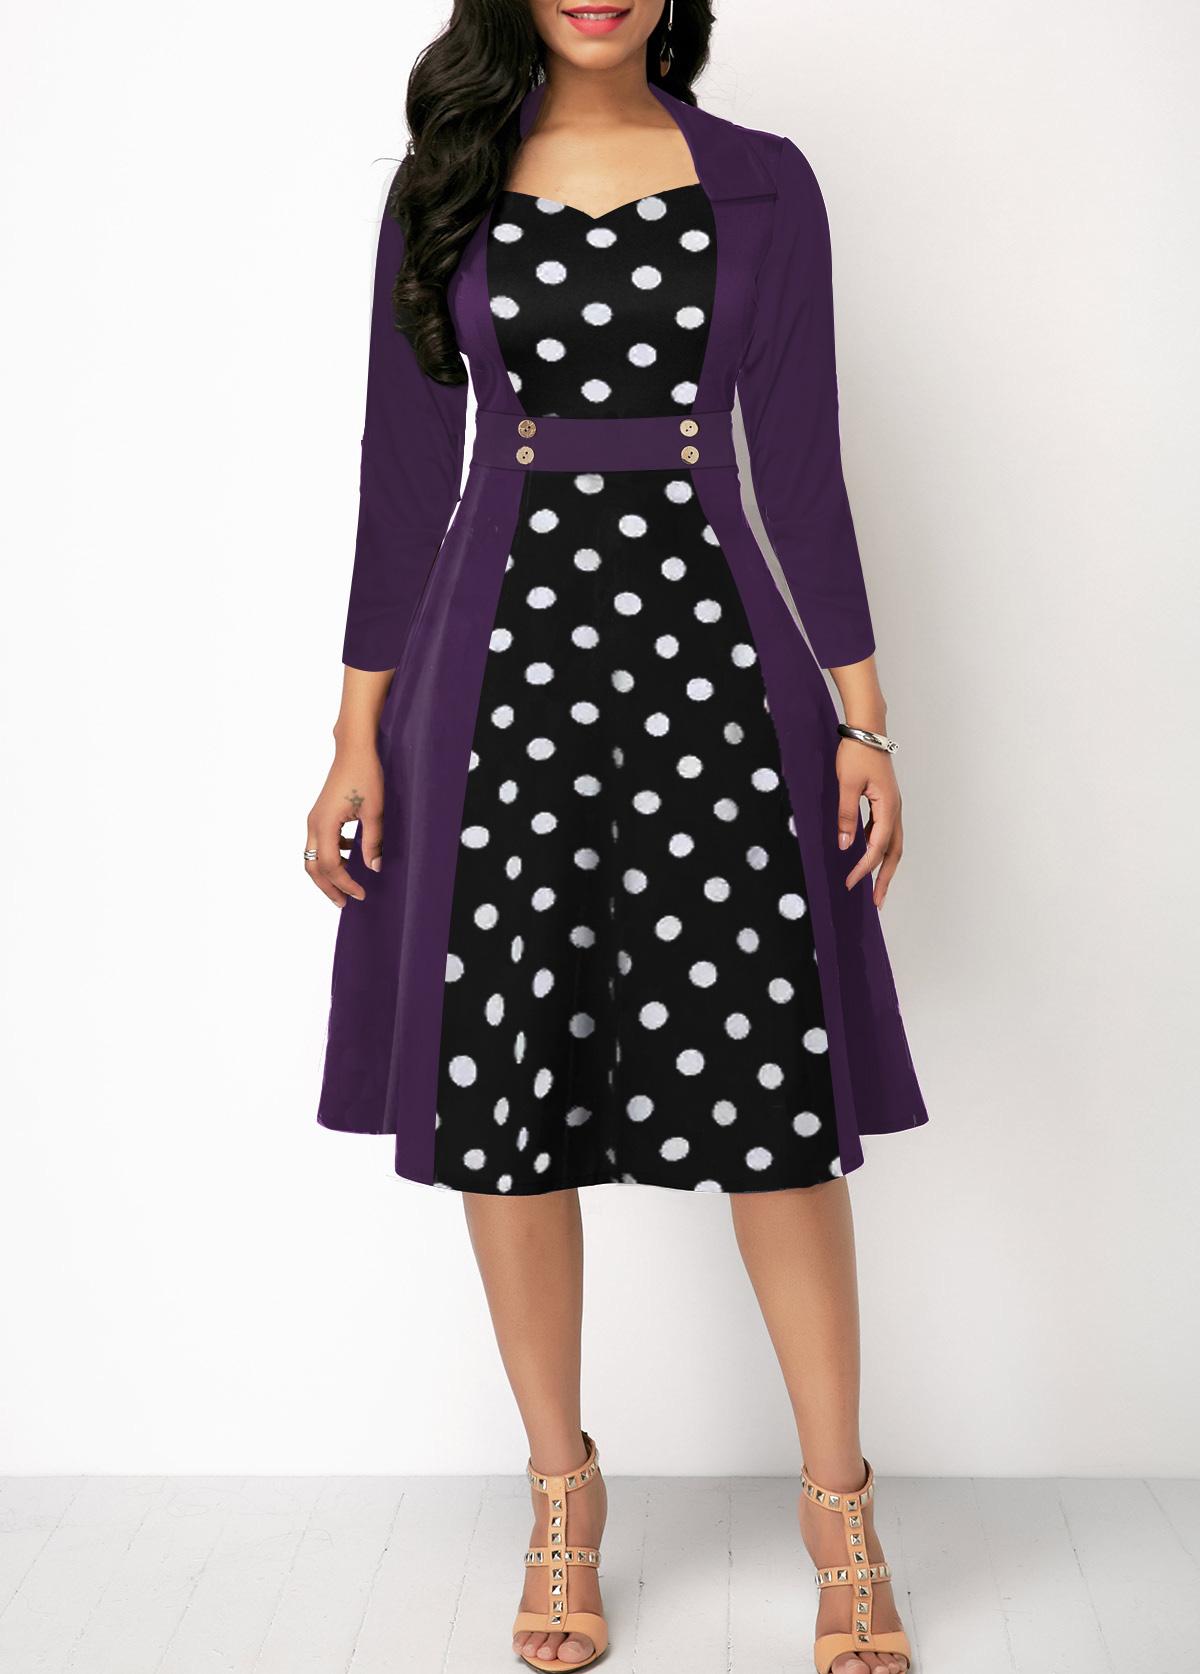 Polka Dot Print Three Quarter Sleeve Button Detail Dress